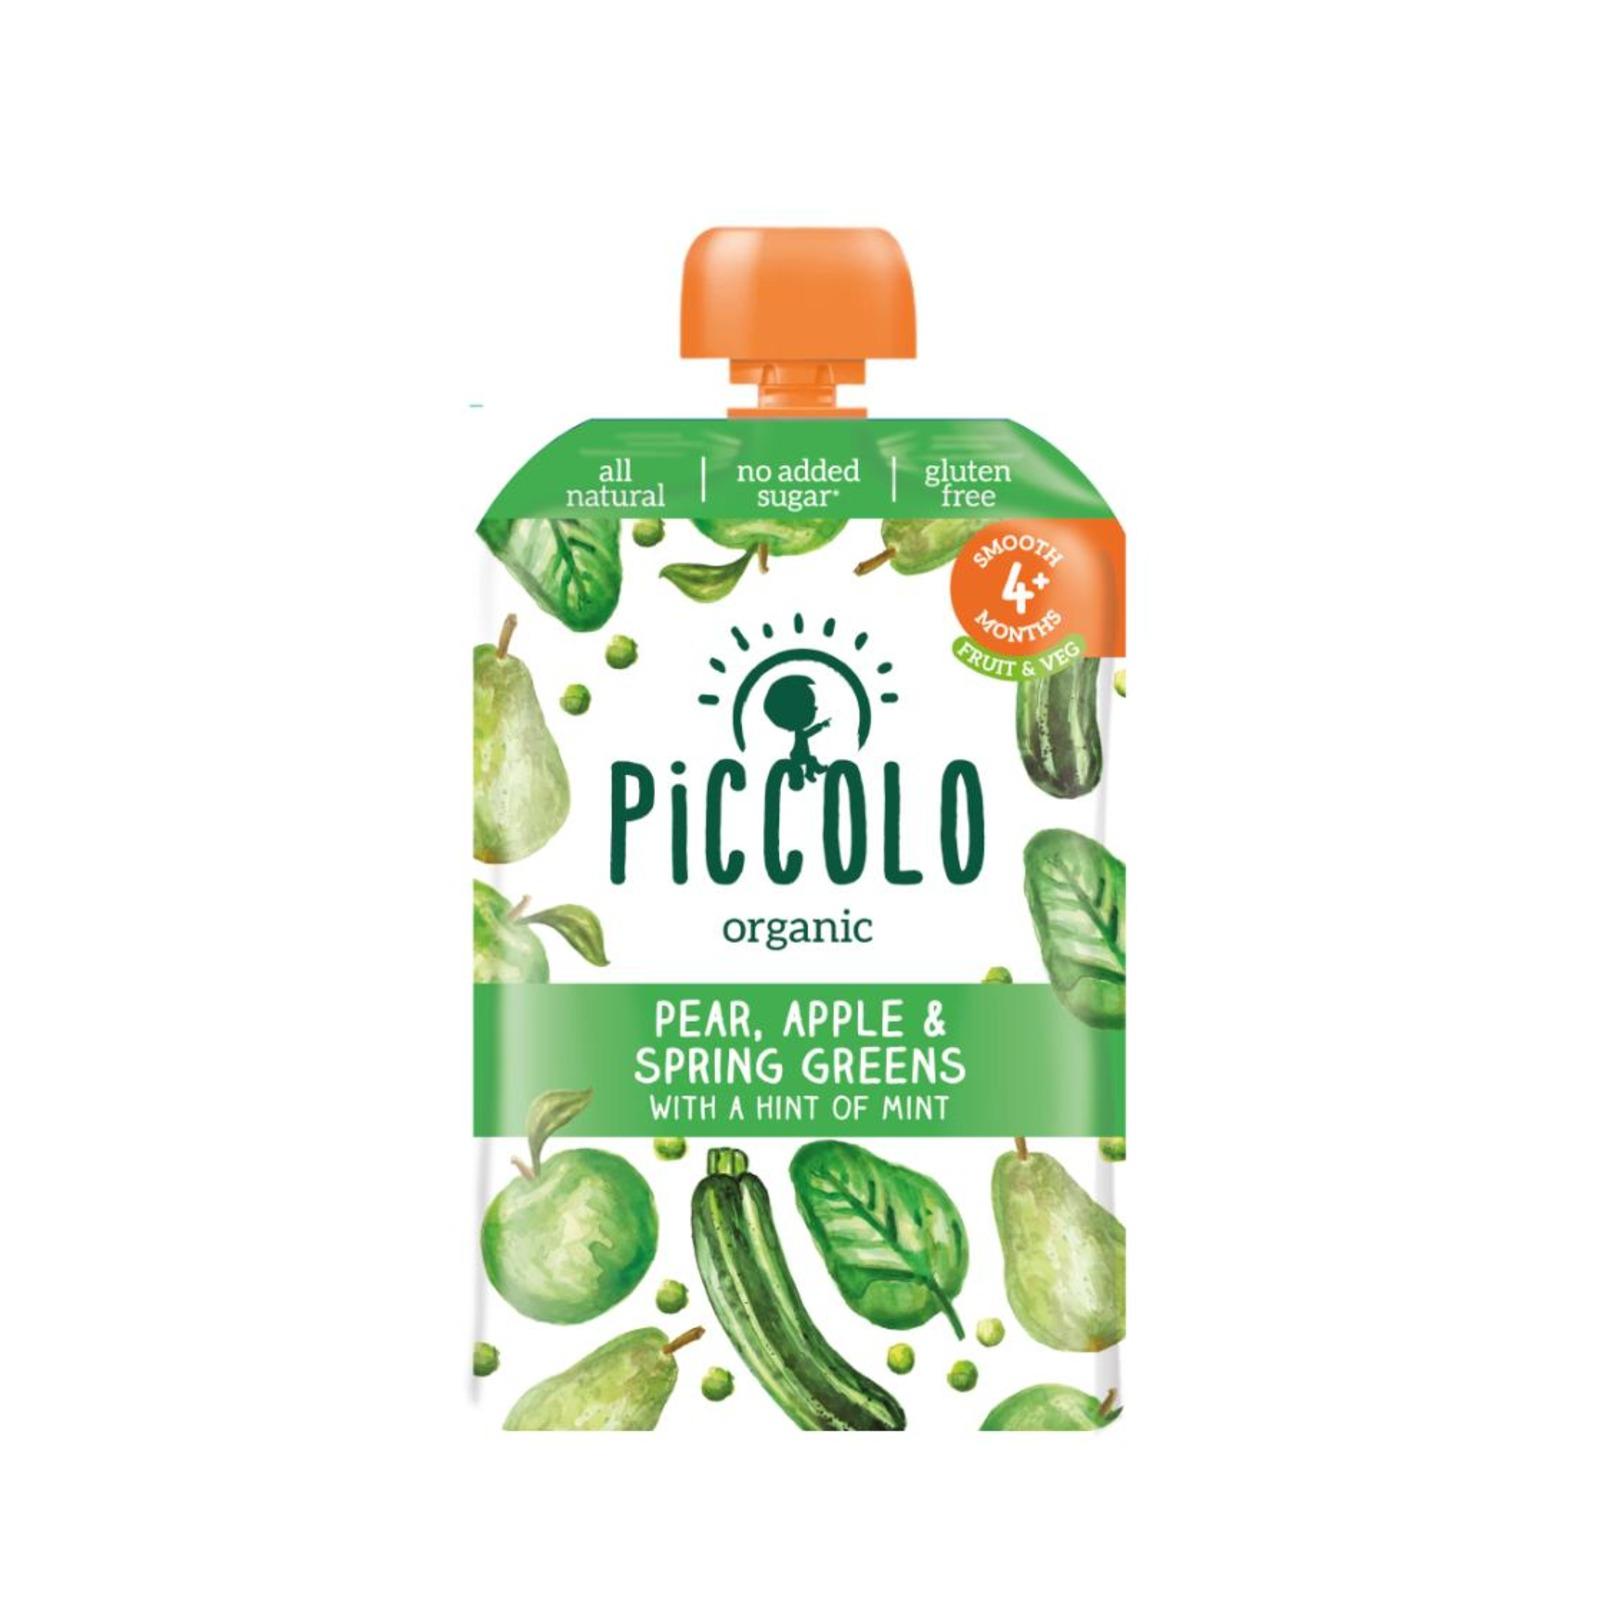 Piccolo Organic Pear, Apple & Spring Greens